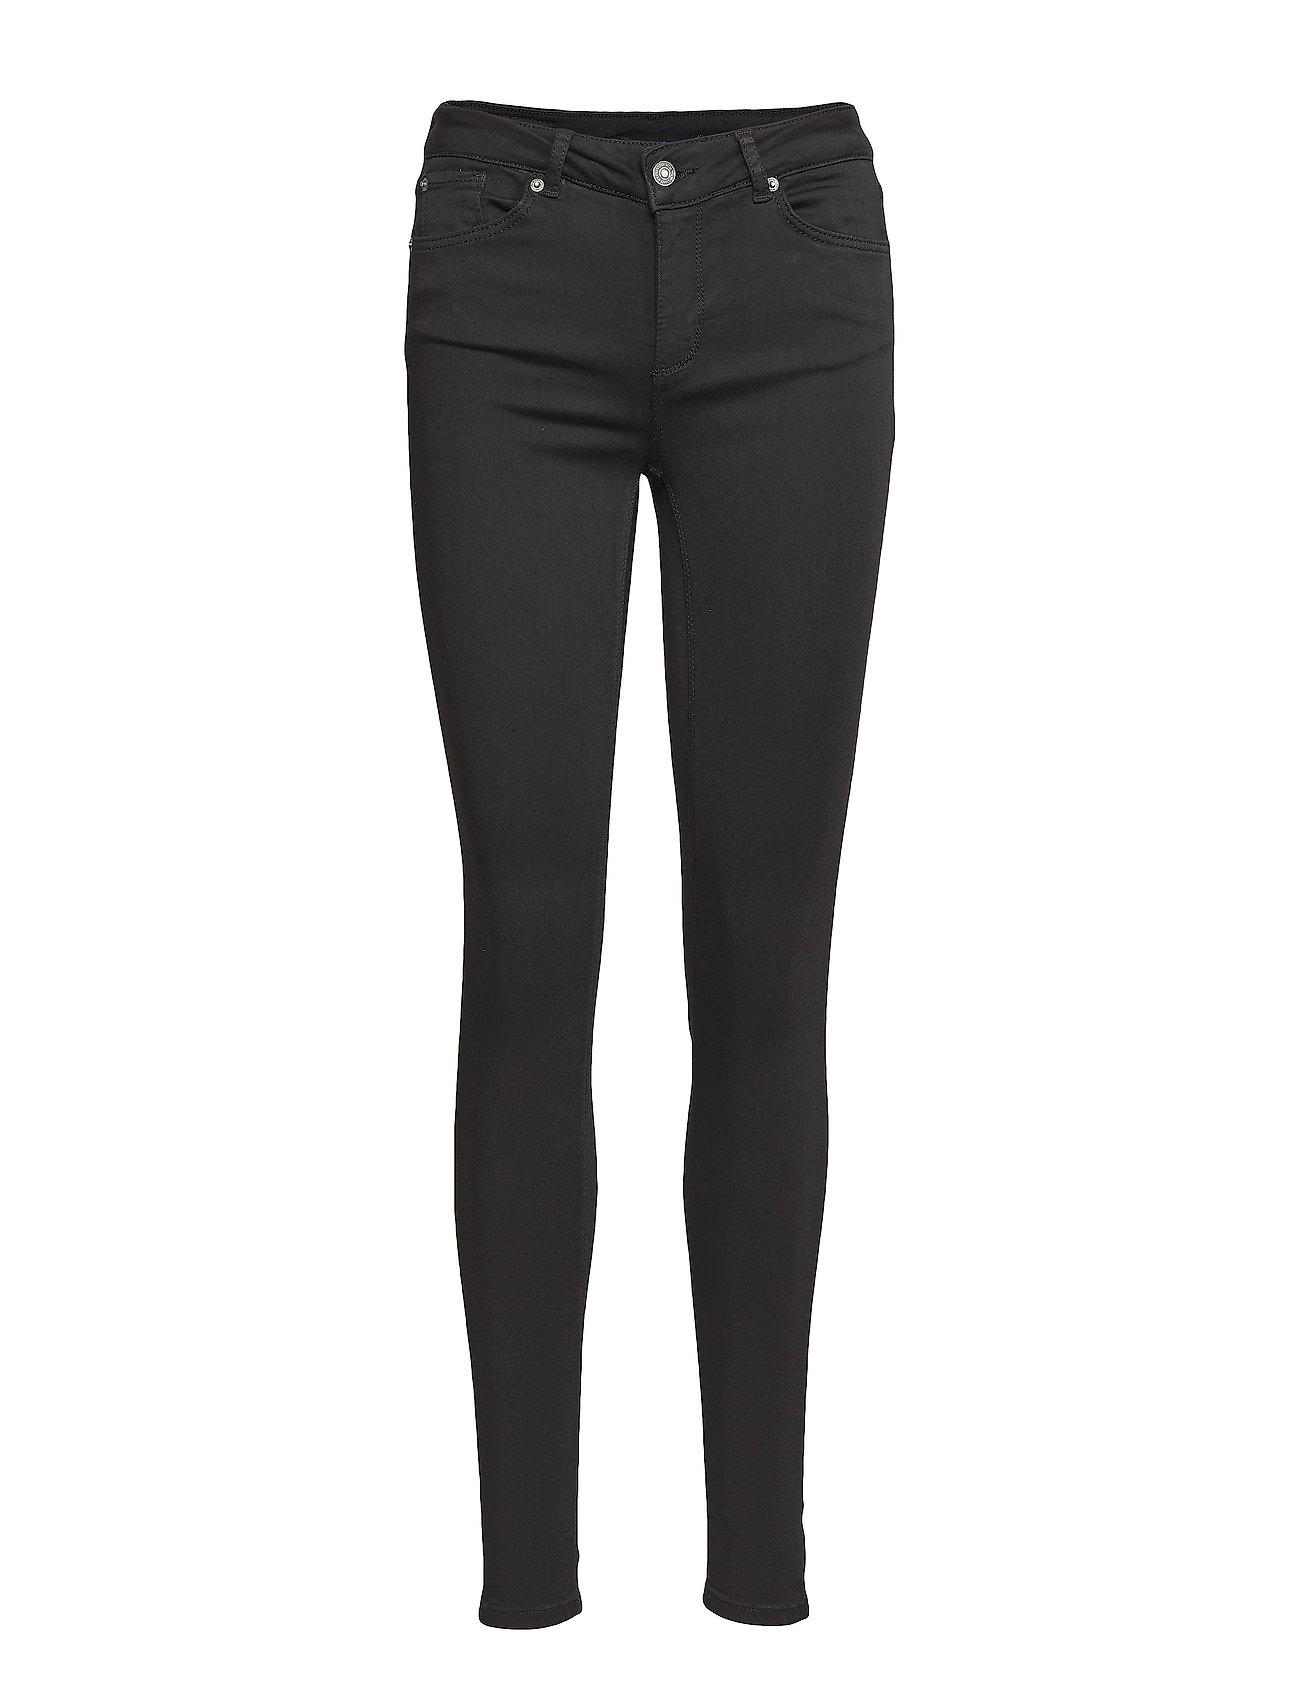 Vero Moda Vmlux Nw Super S Jeans Ba037 Ga Noos Skinny Farkut Musta Vero Moda